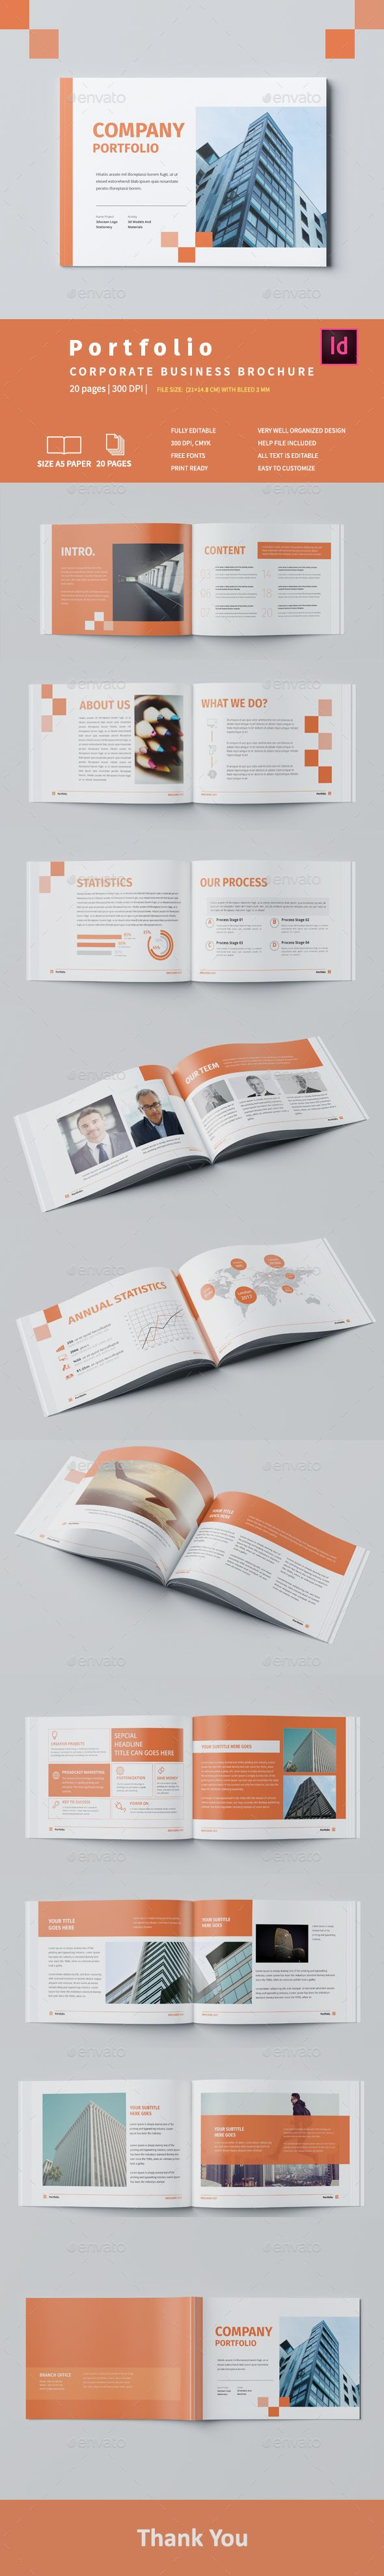 Company Portfolio A5 Brochure Template InDesign INDD